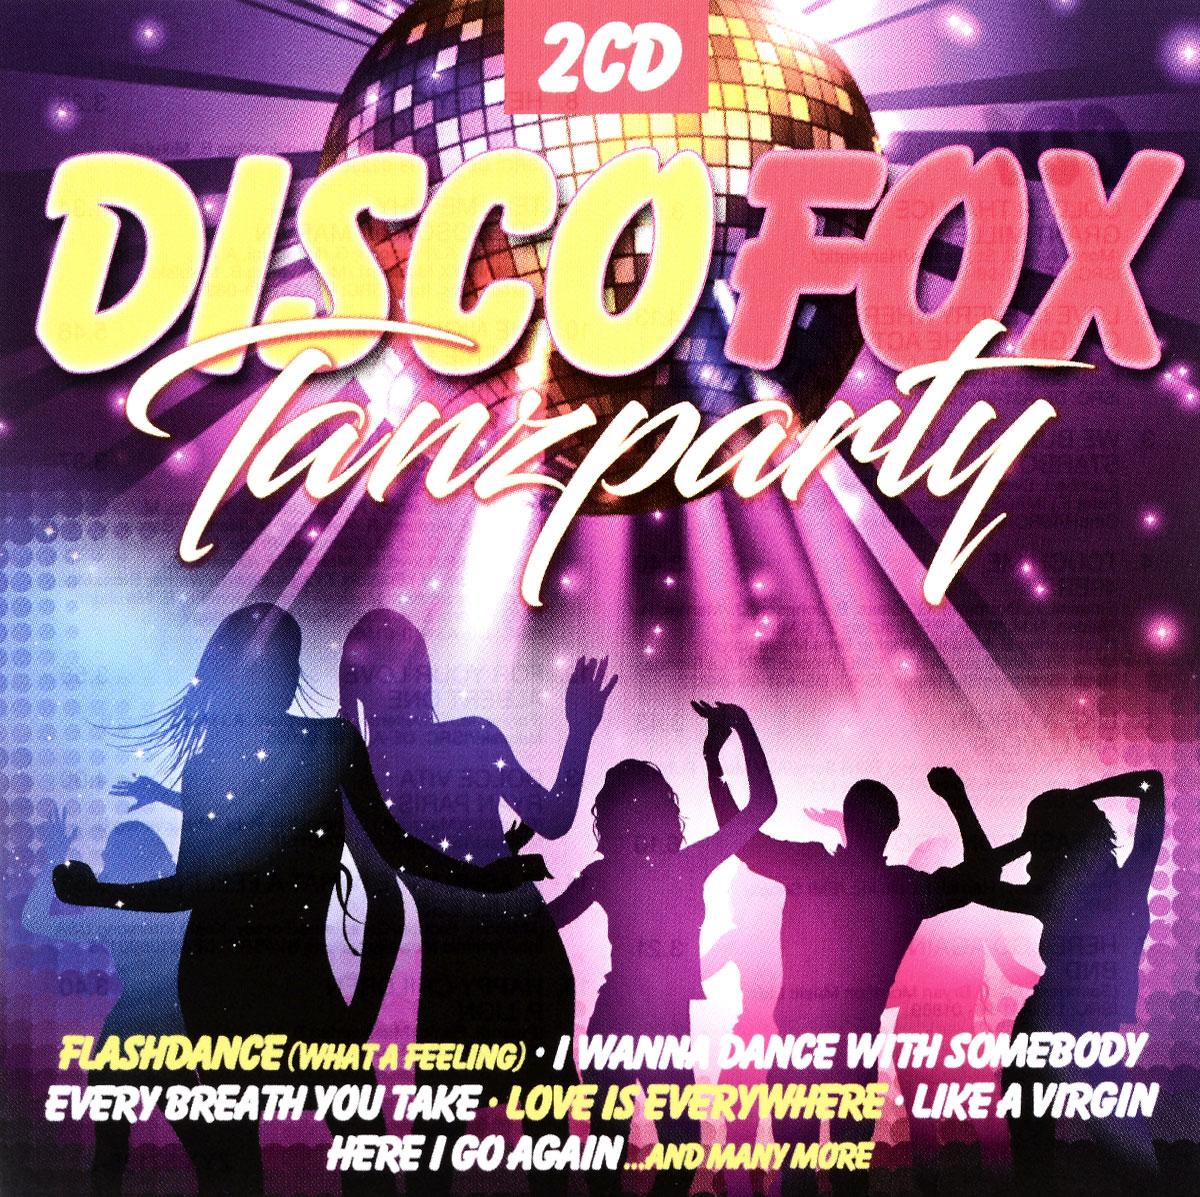 Disco Fox Tanzparty (2 CD) deutscher disco fox 2011 2 cd